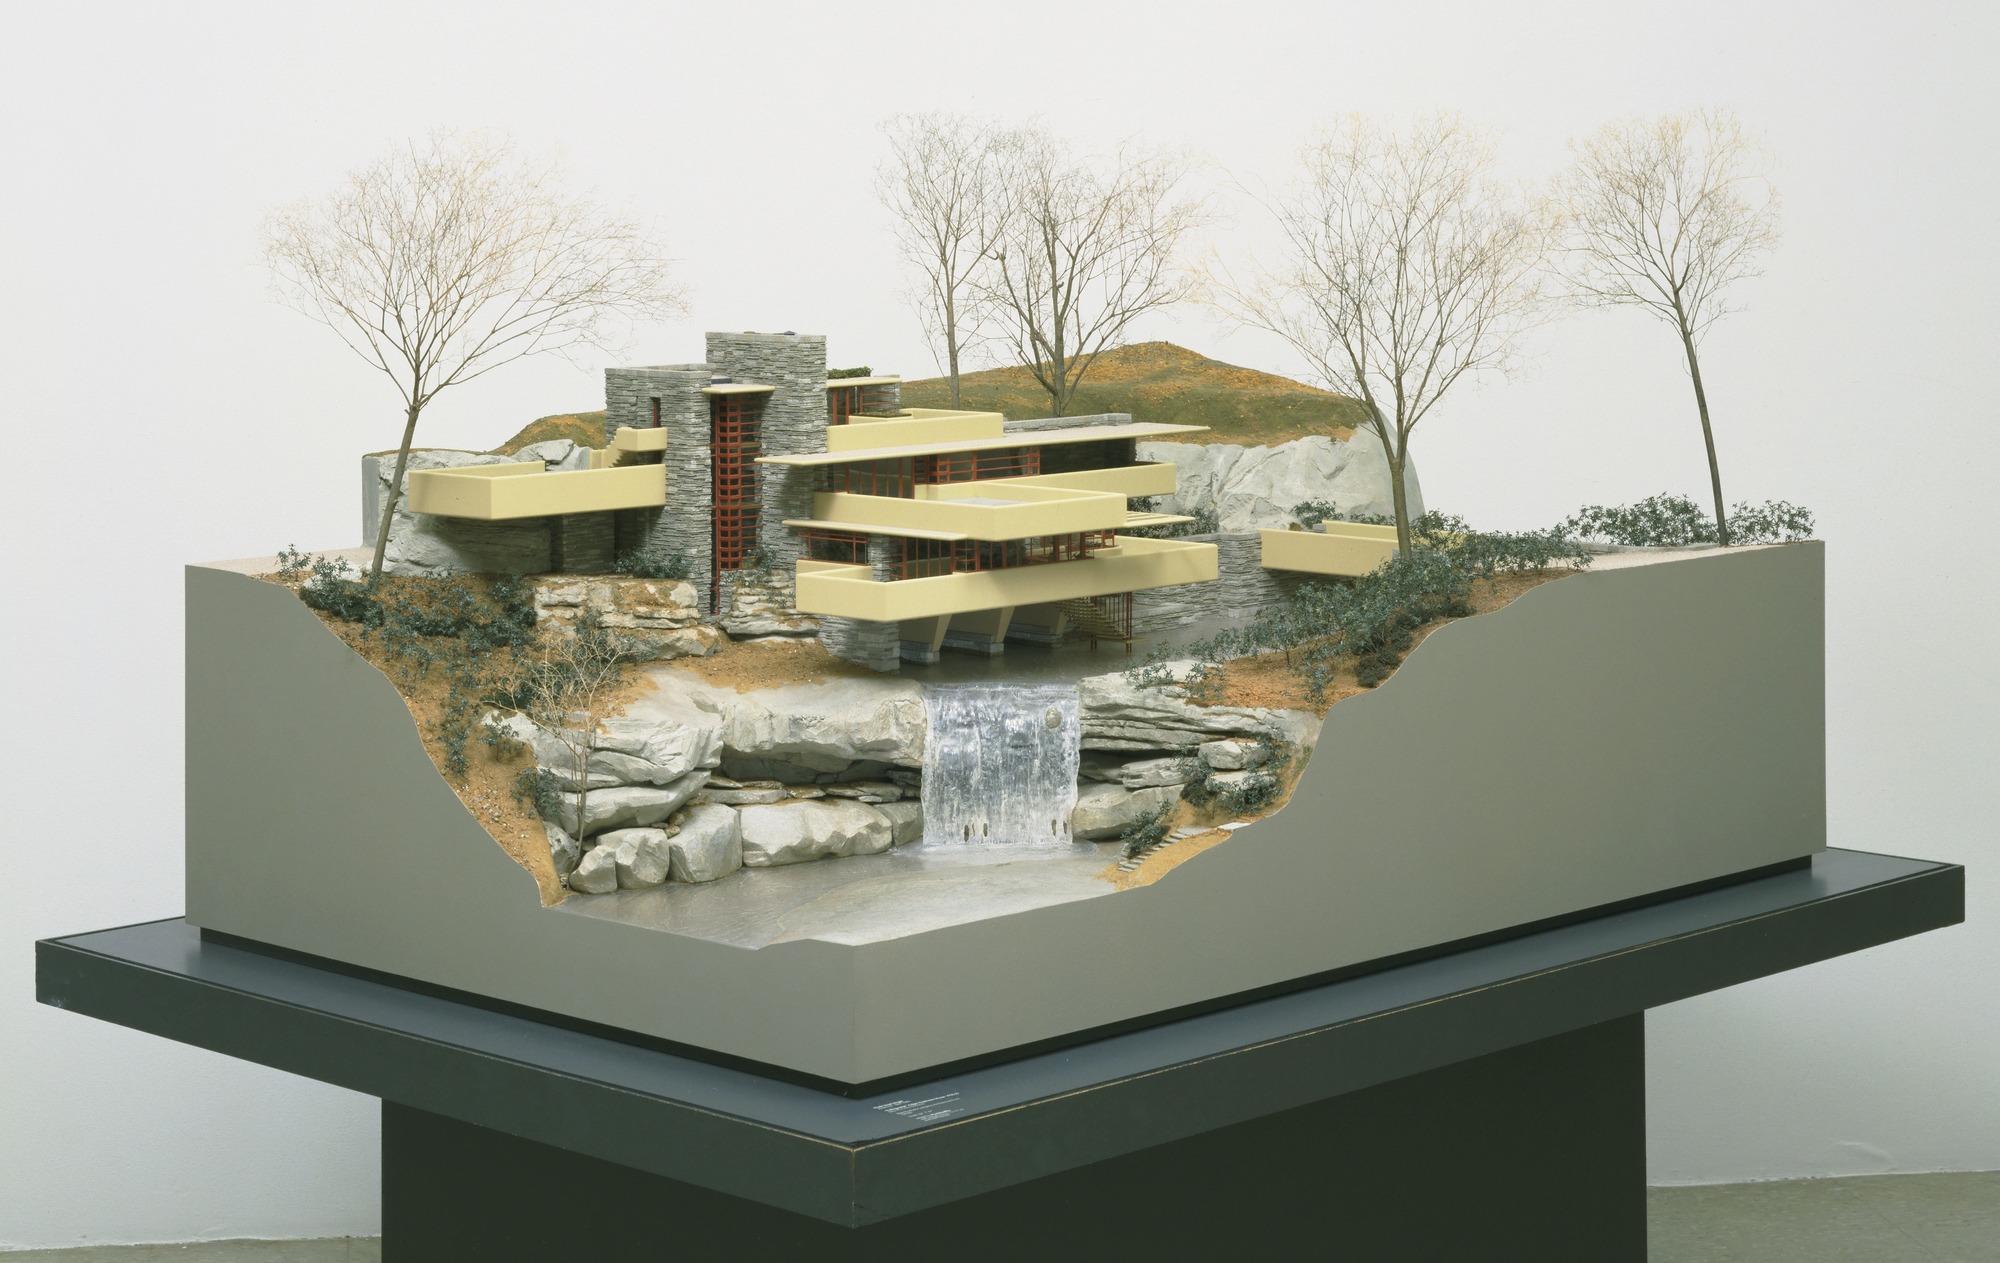 Model of Frank Lloyd Wright's Fallingwater